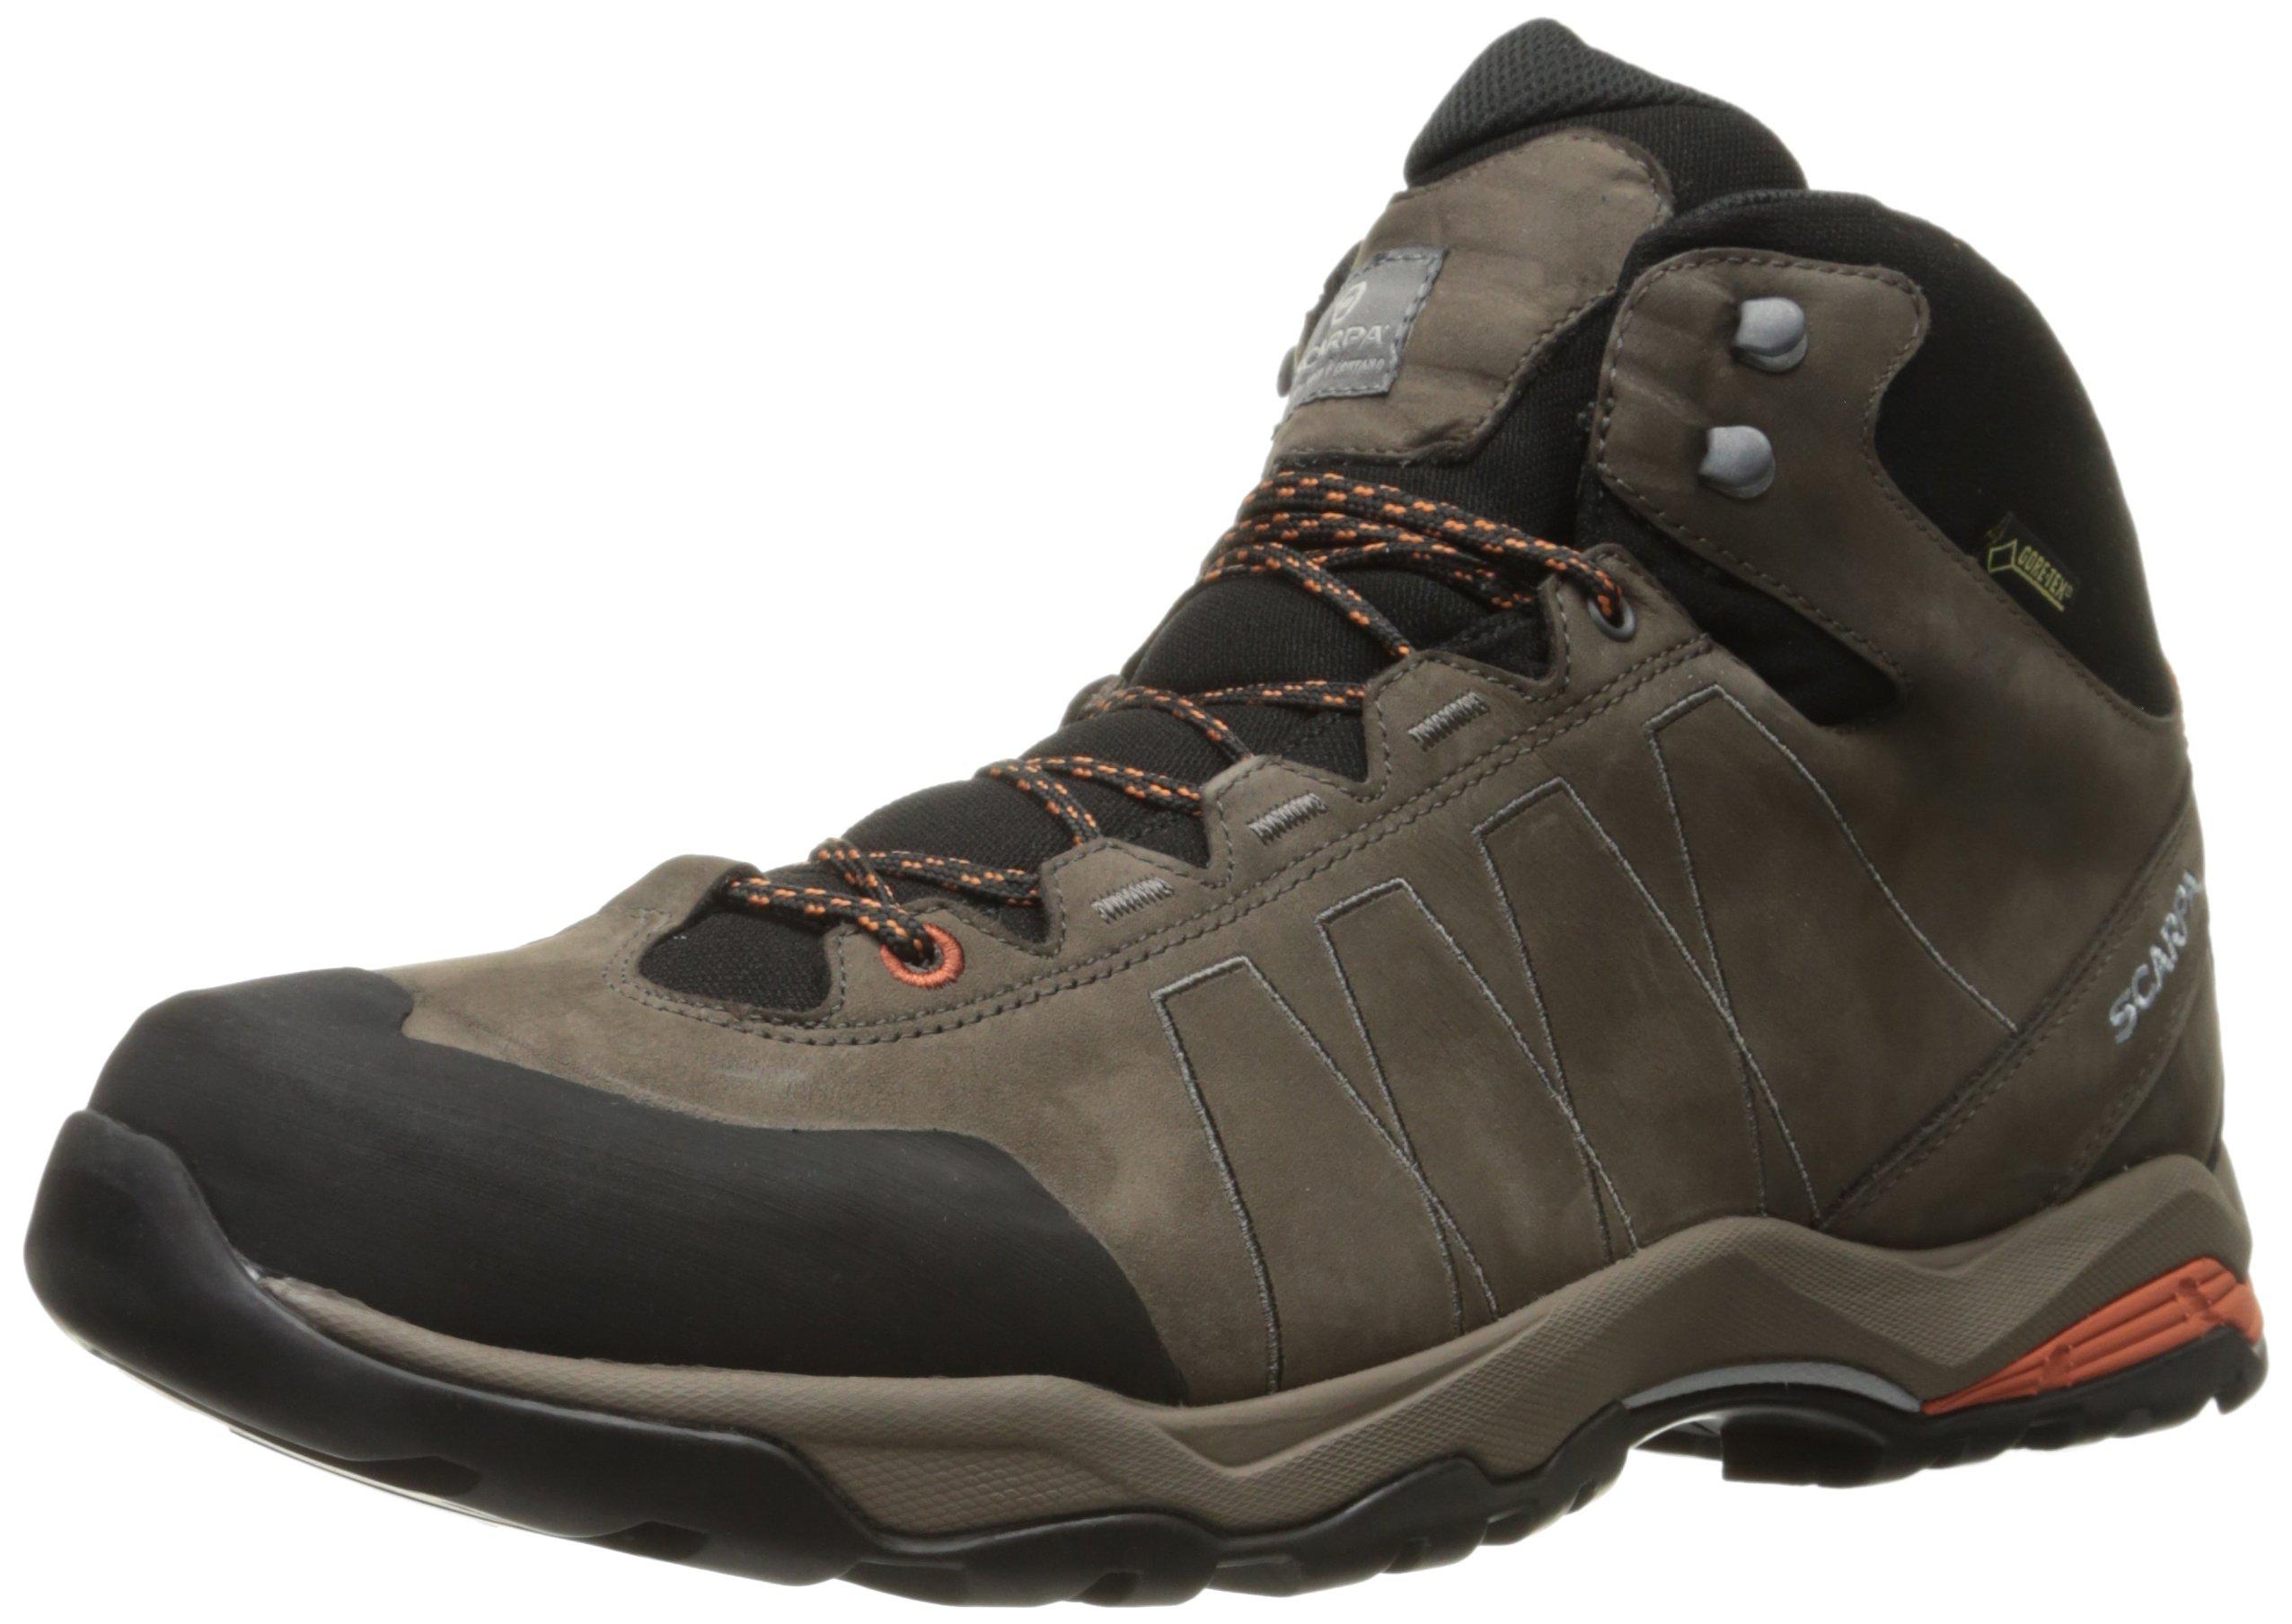 Scarpa Men's Moraine Plus Mid GTX Boot Hiking Boot, Charcoal/Mango, 42.5 EU/9.5 M US